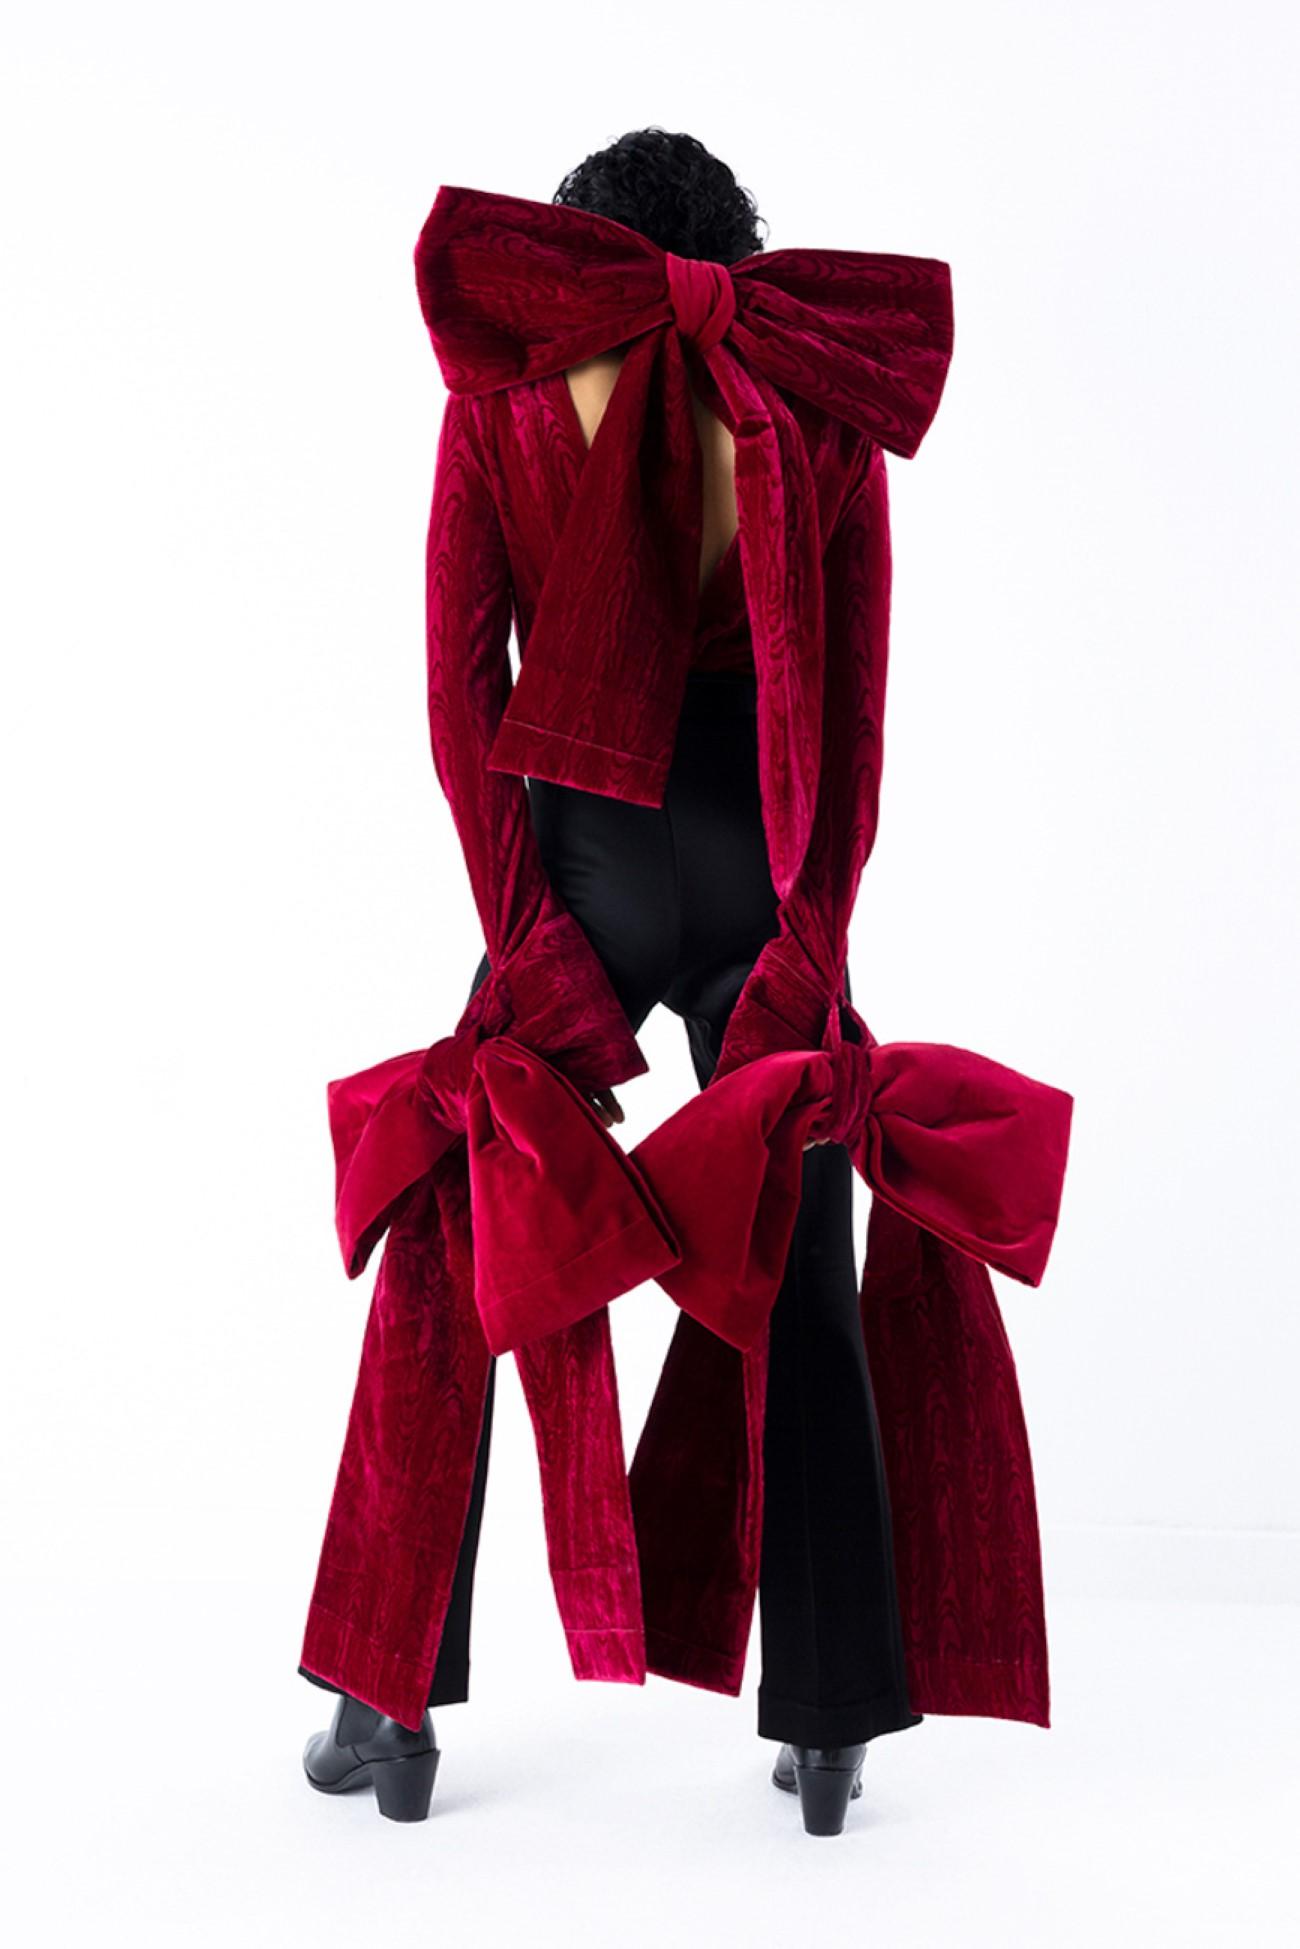 Arturo Obegero - Automne-Hiver 2021 - Paris Fashion Week